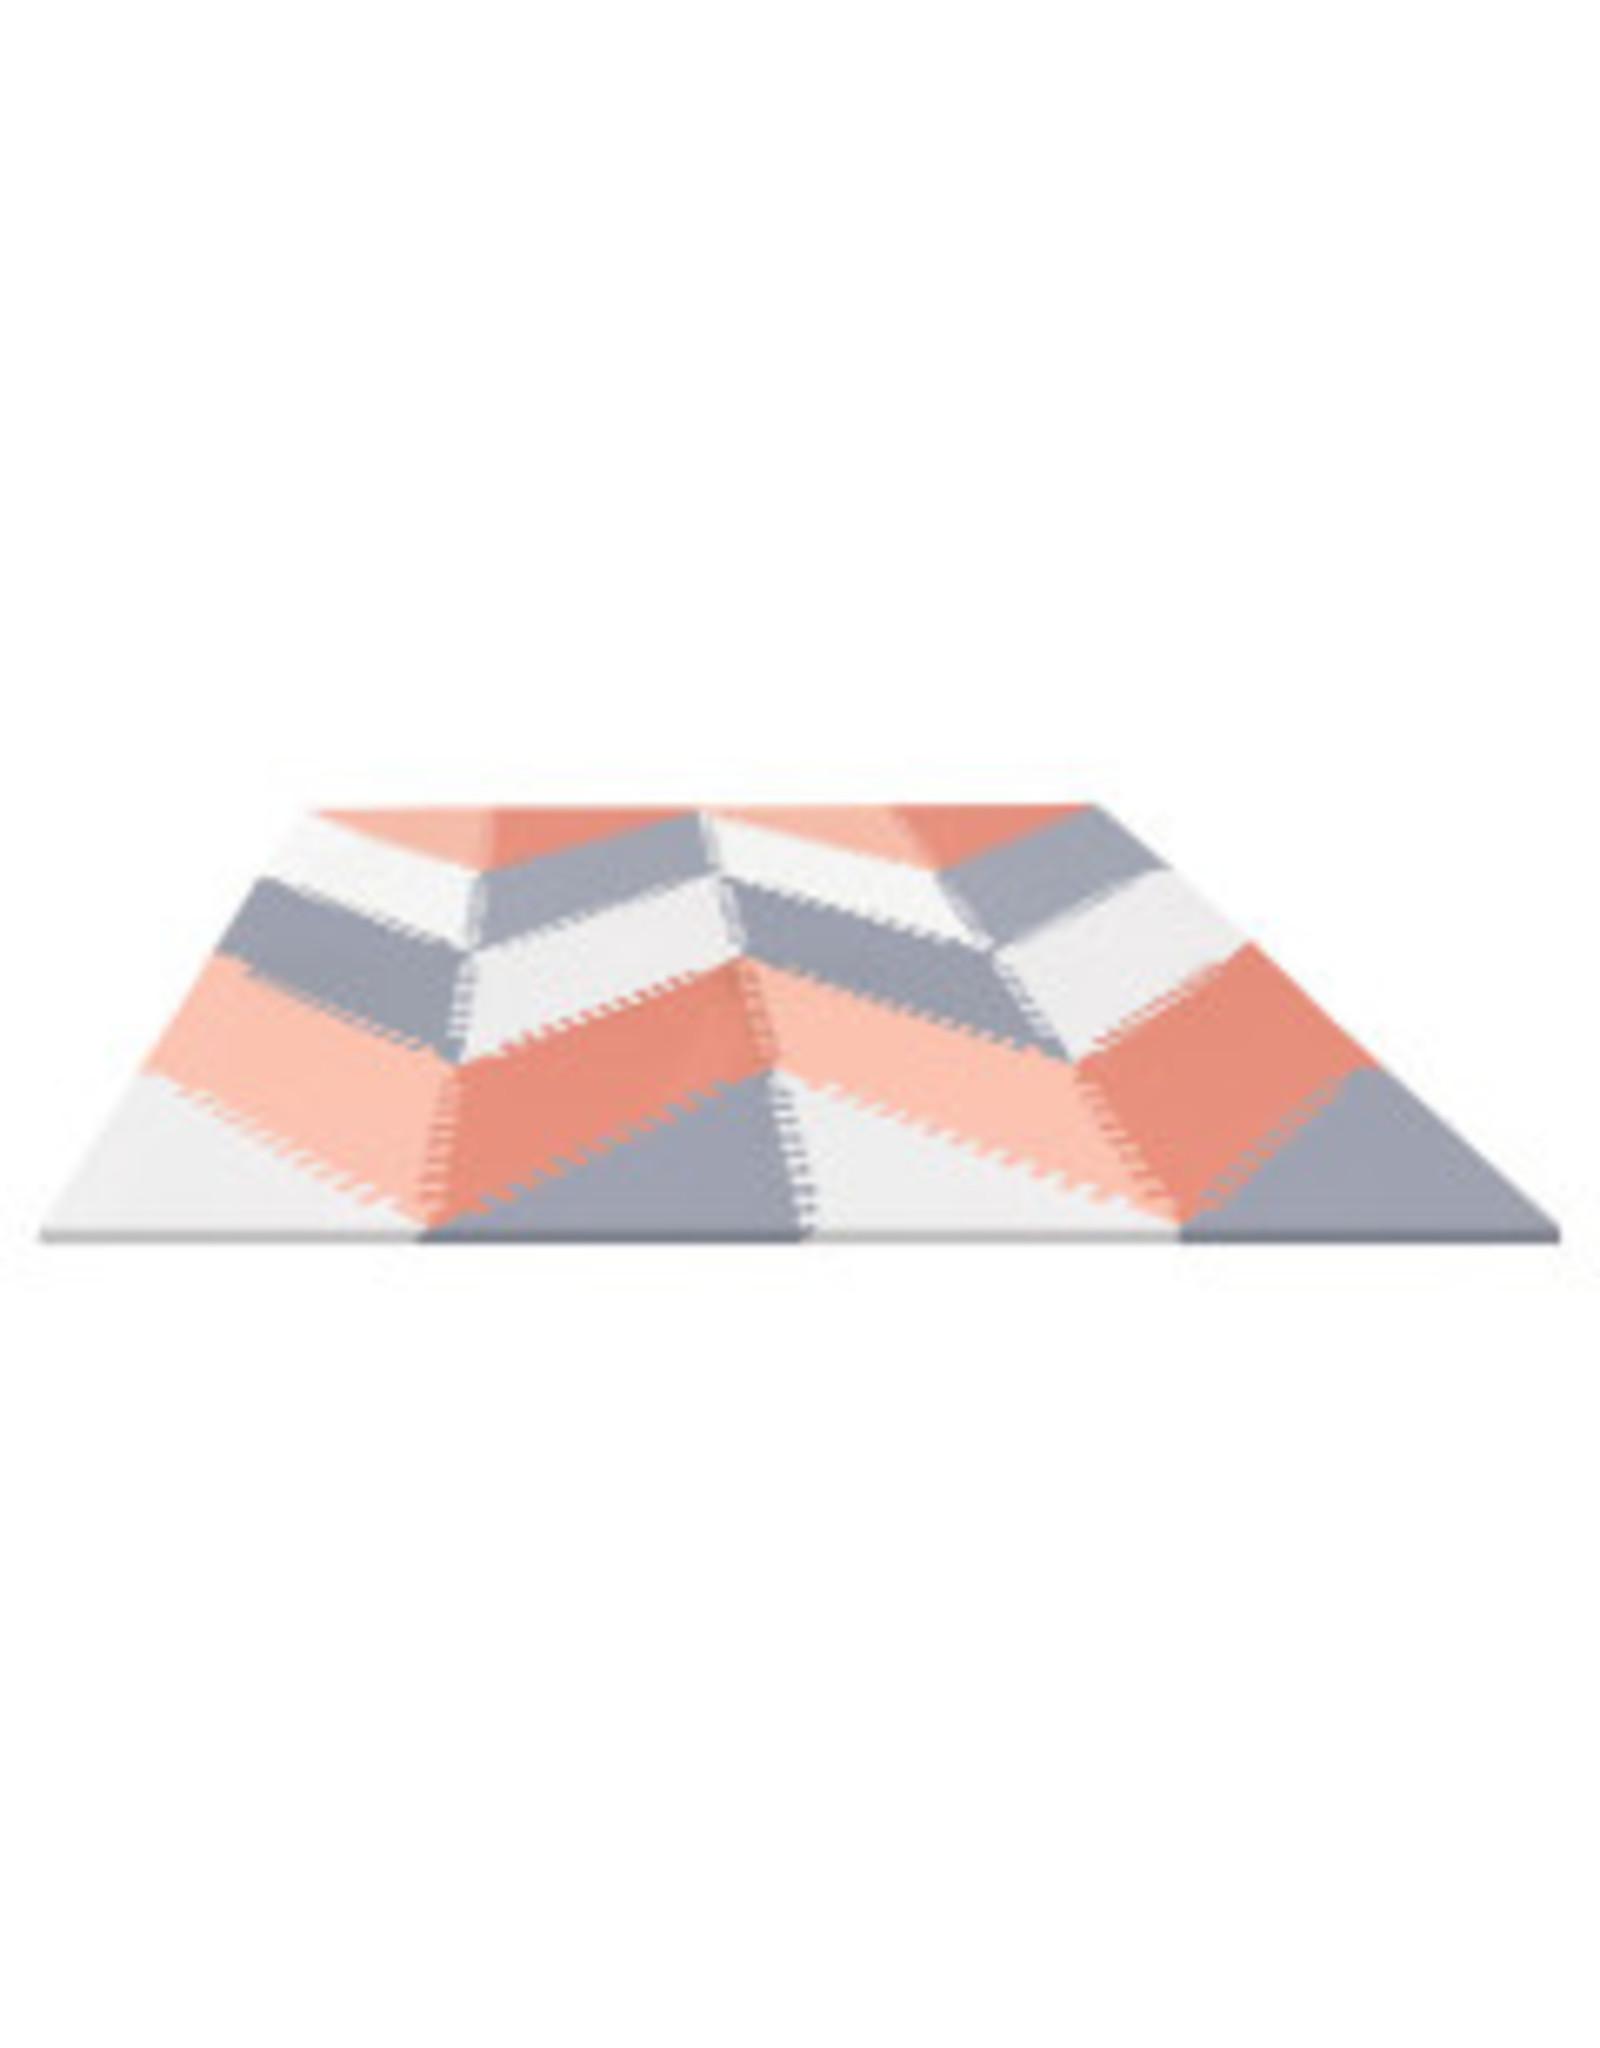 Play Spot Floor Tiles Grey/Peach REG TA